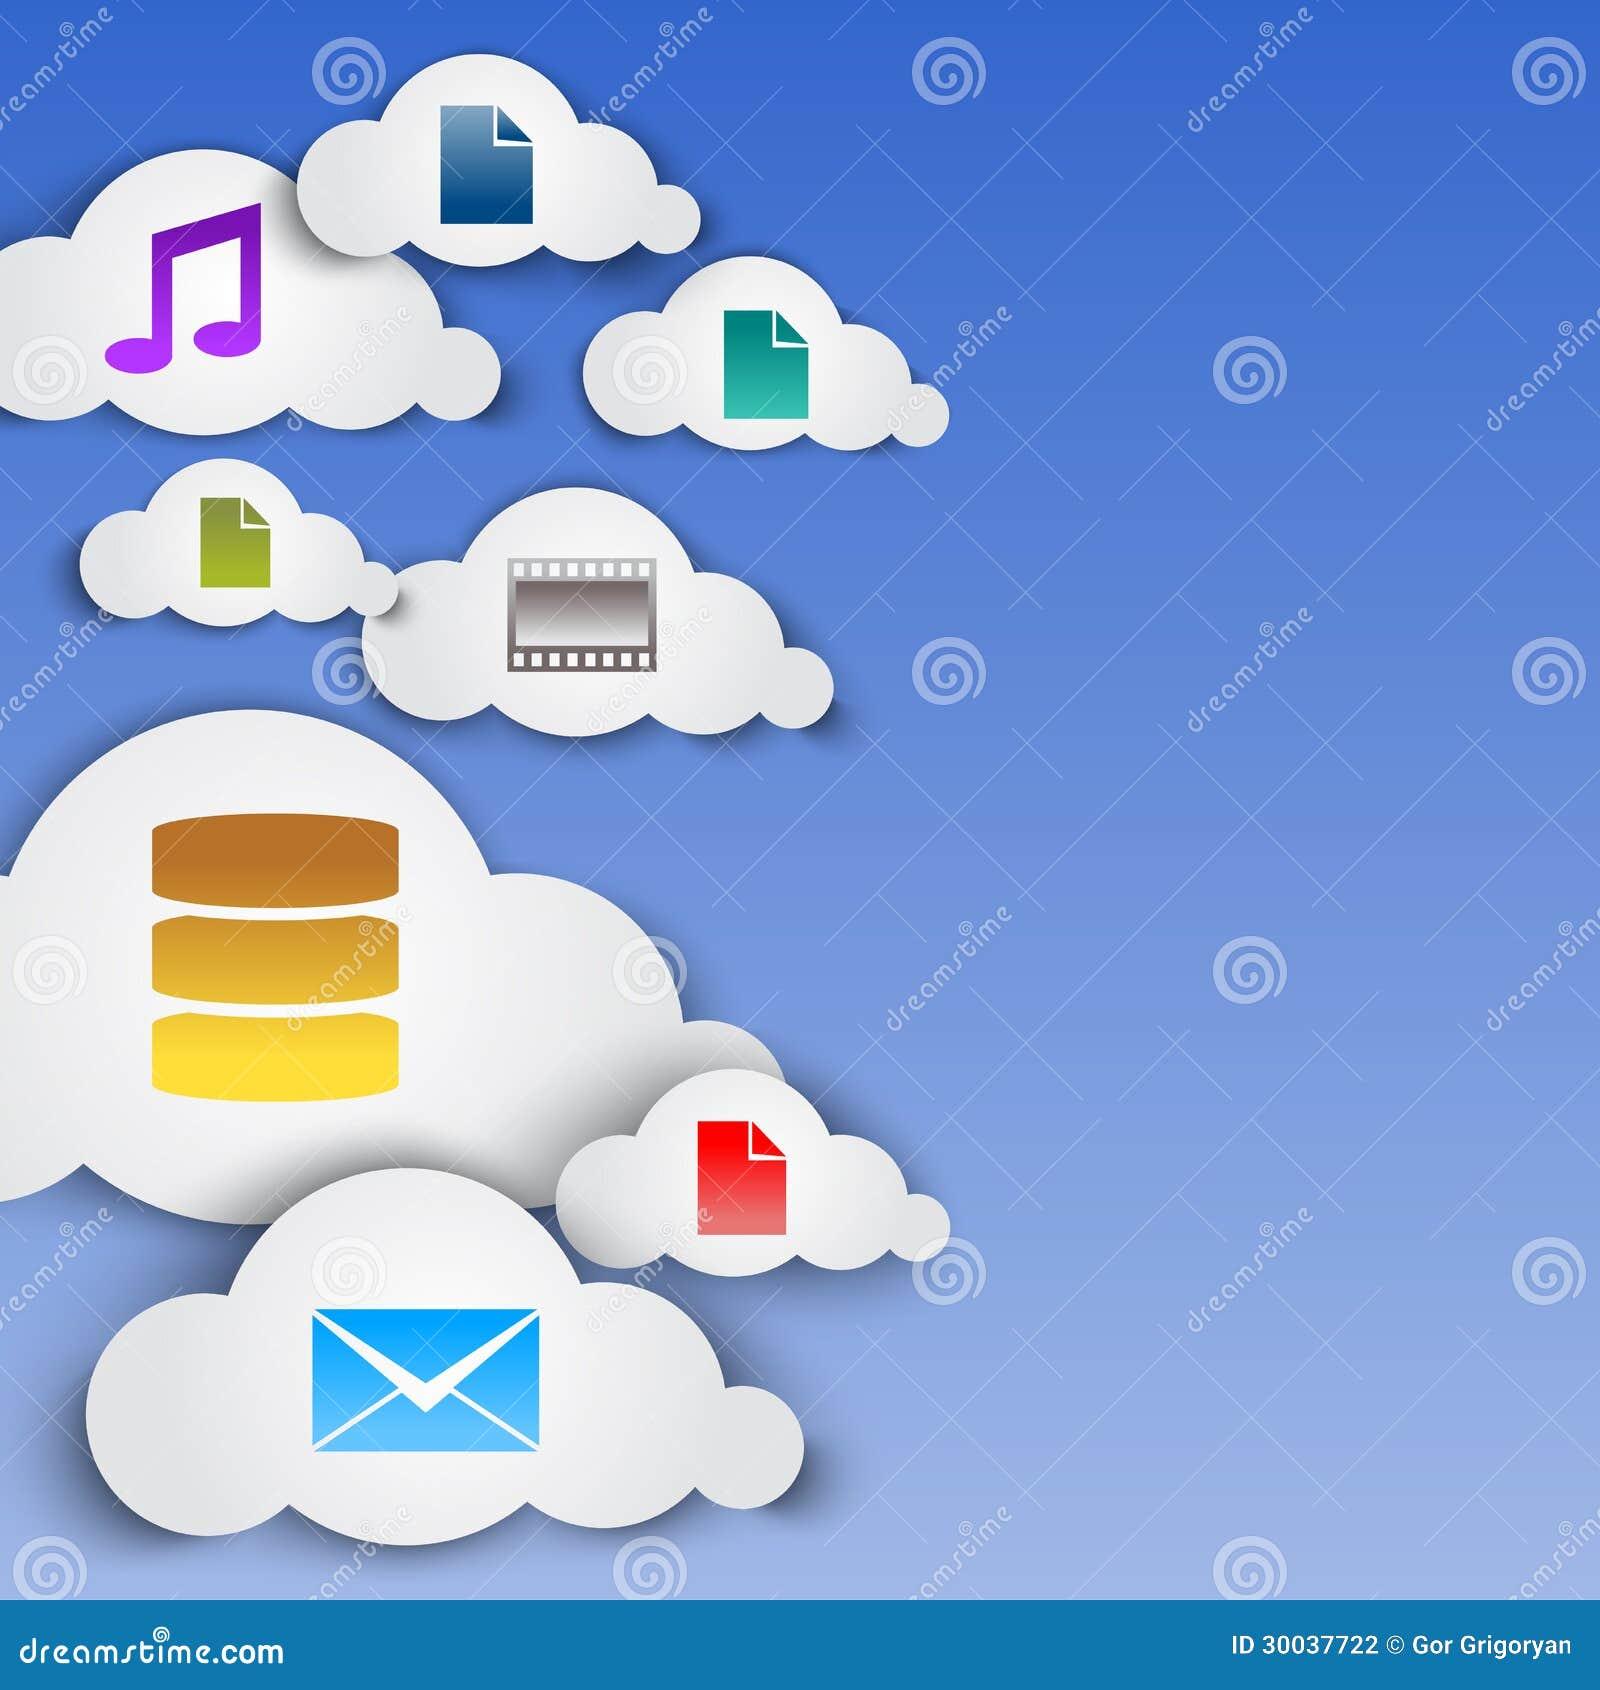 cloud computing essay cloud computing essay cloud computing software